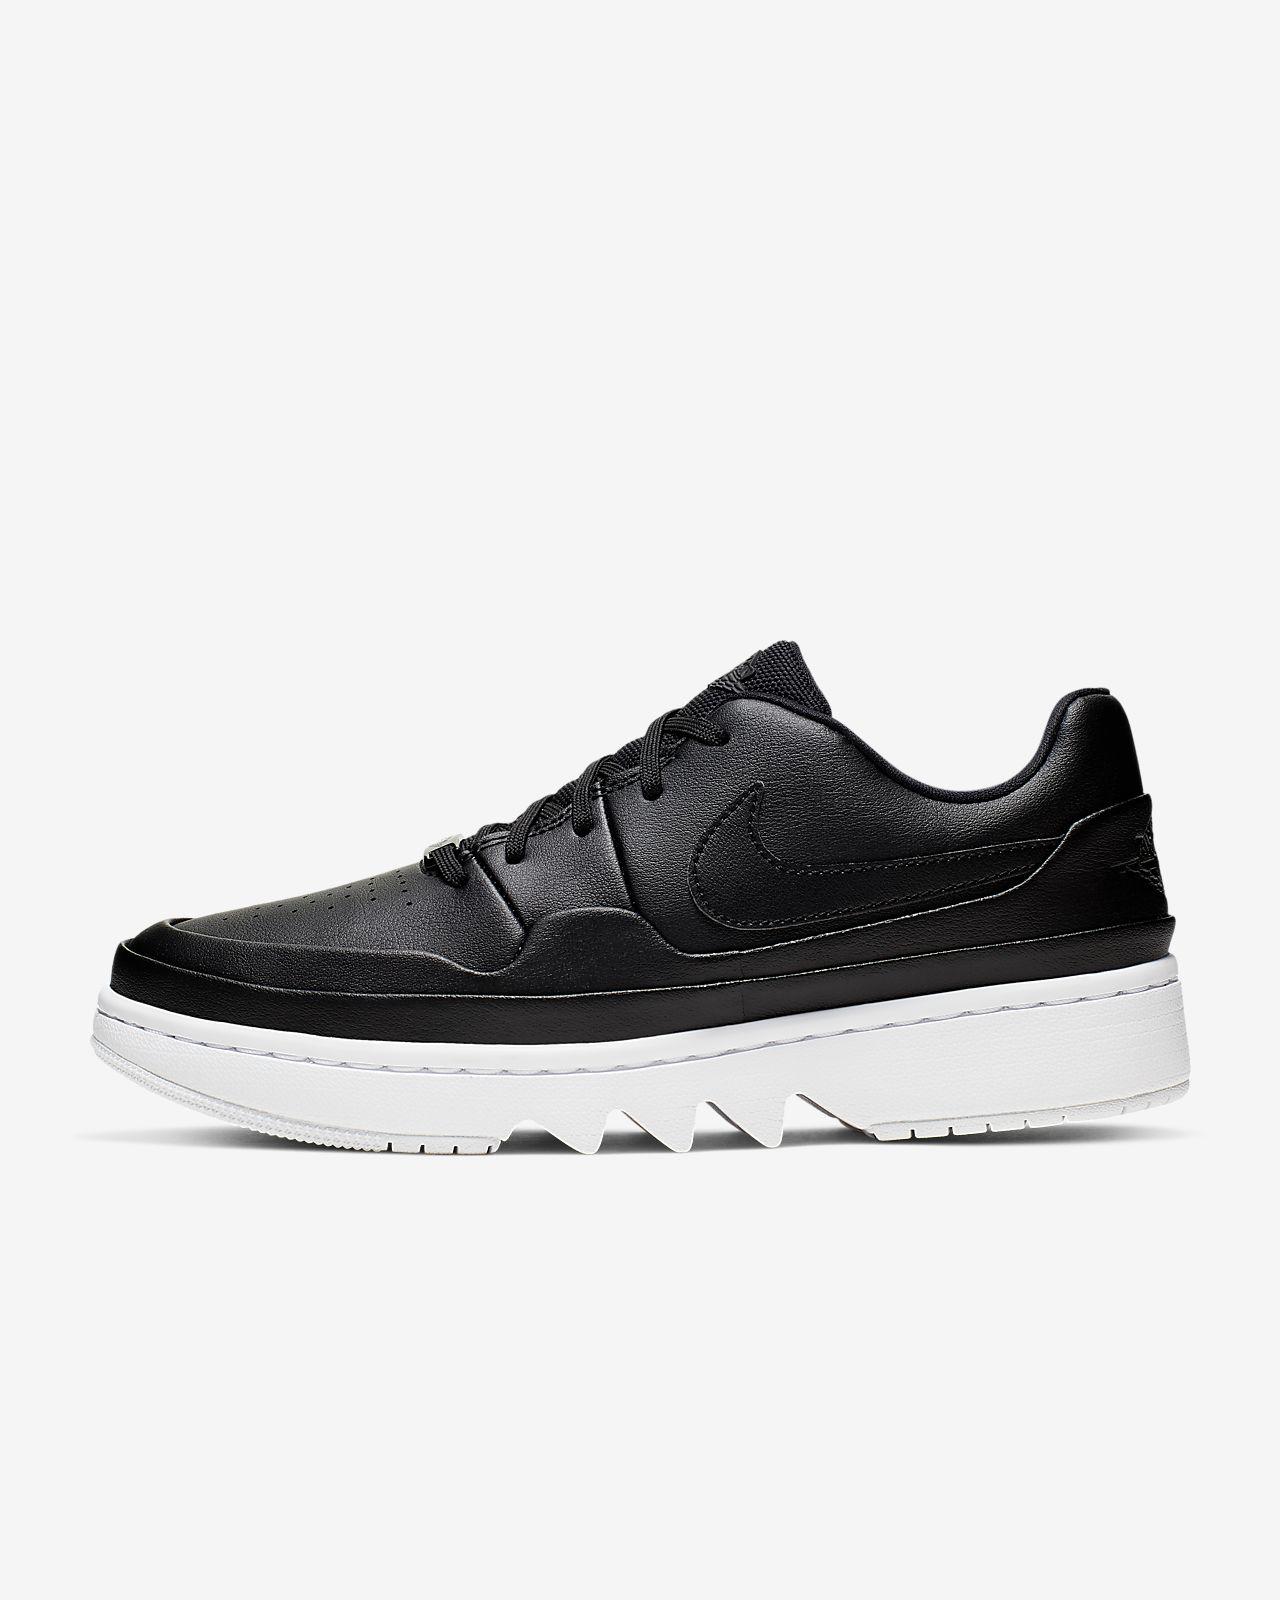 Air Jordan 1 Jester XX Low Laced Zapatillas - Mujer